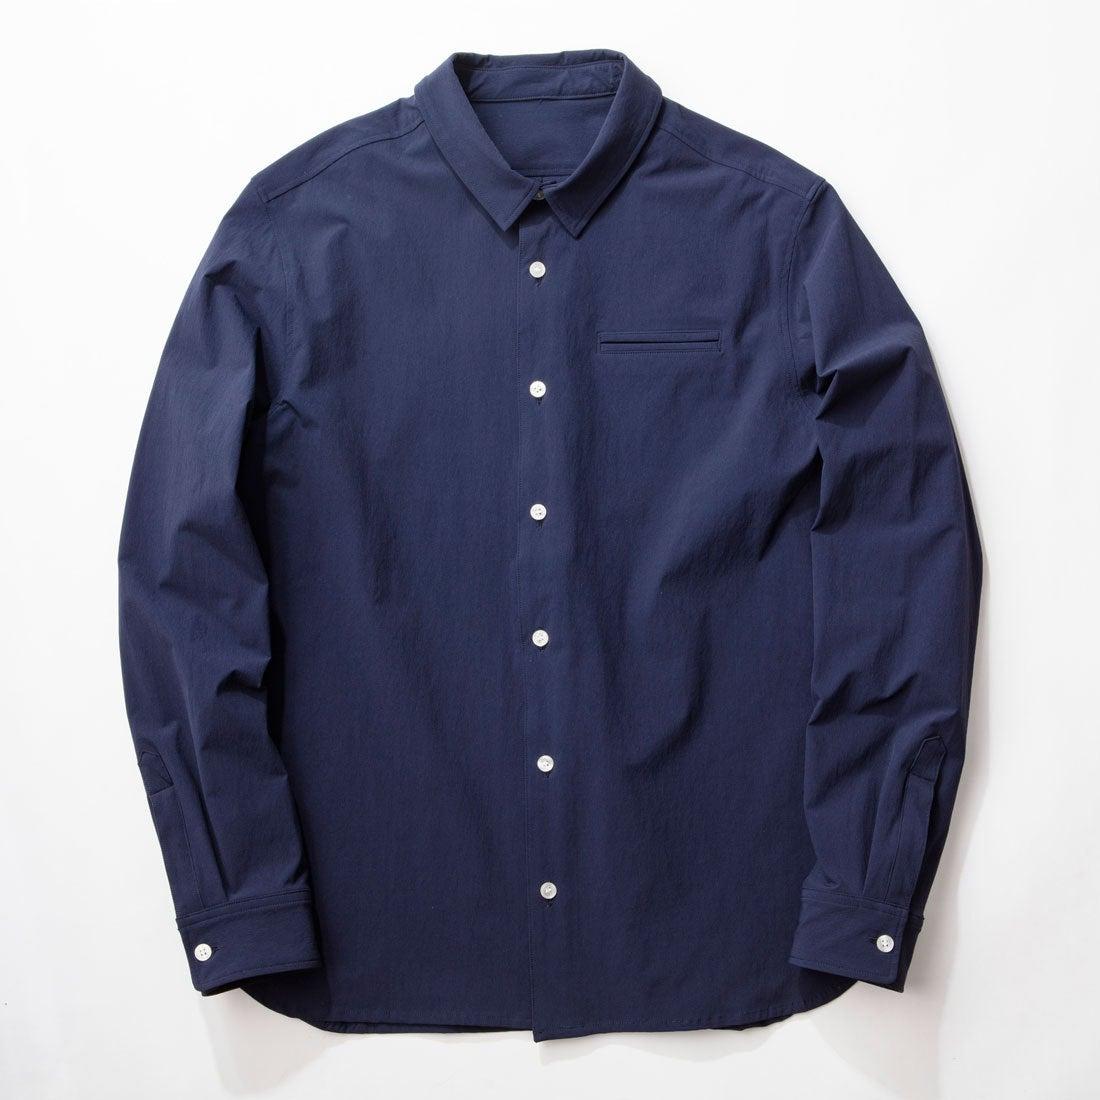 MNT 4WAY Bicolor Stretch Shirt